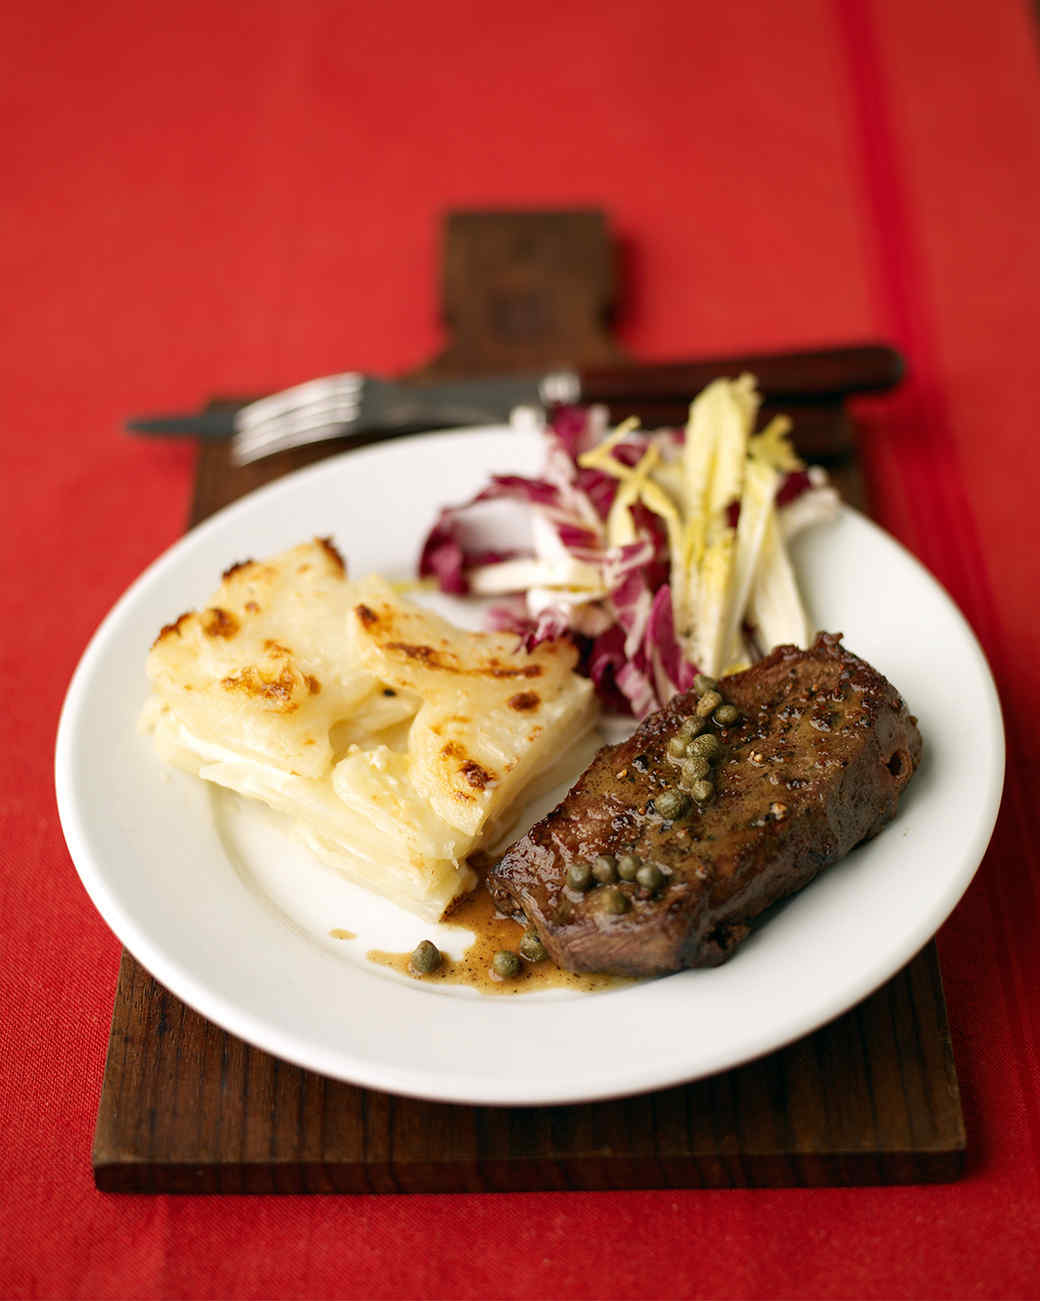 Steak with Wine Sauce and Potato Gratin